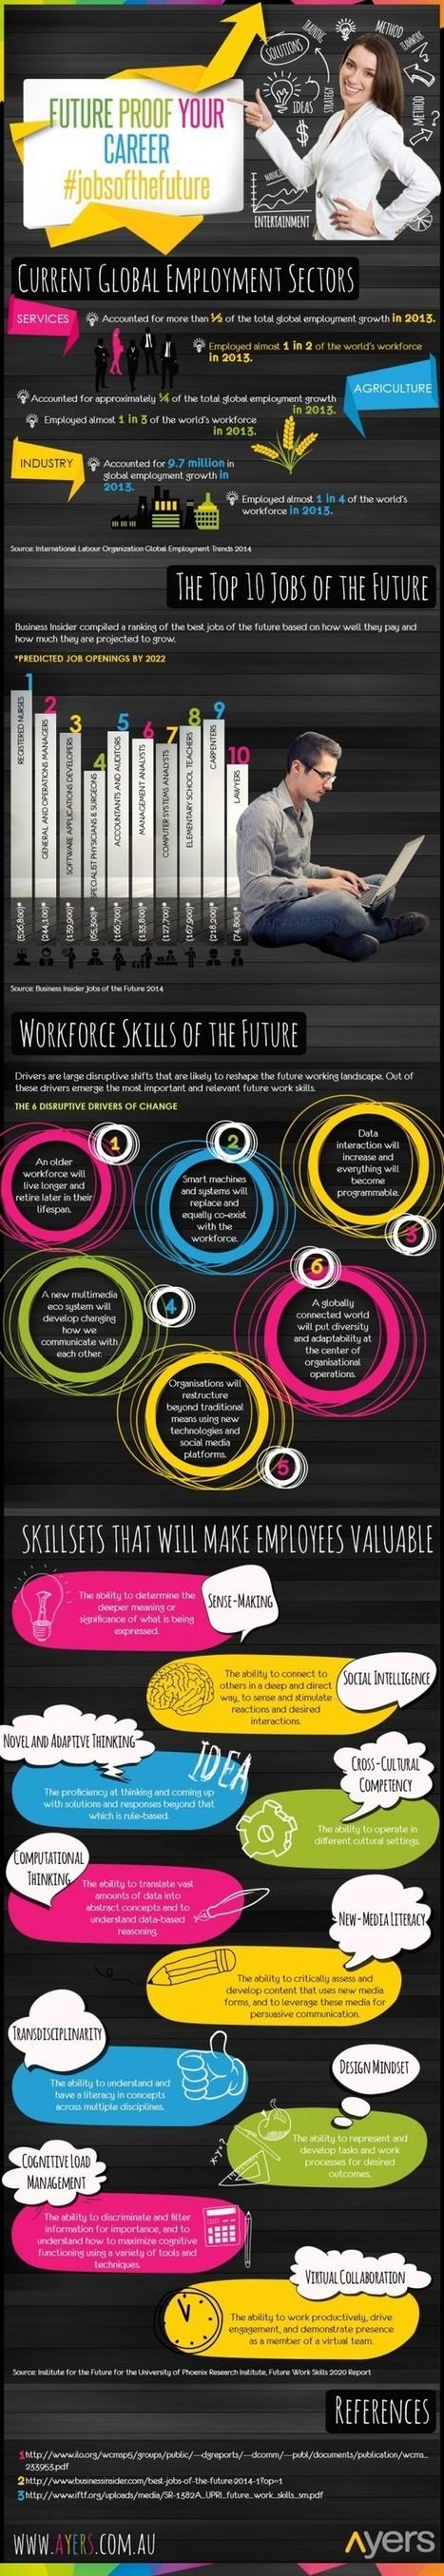 Futureproof your career (infographic)   APRENDIZAJE   Scoop.it